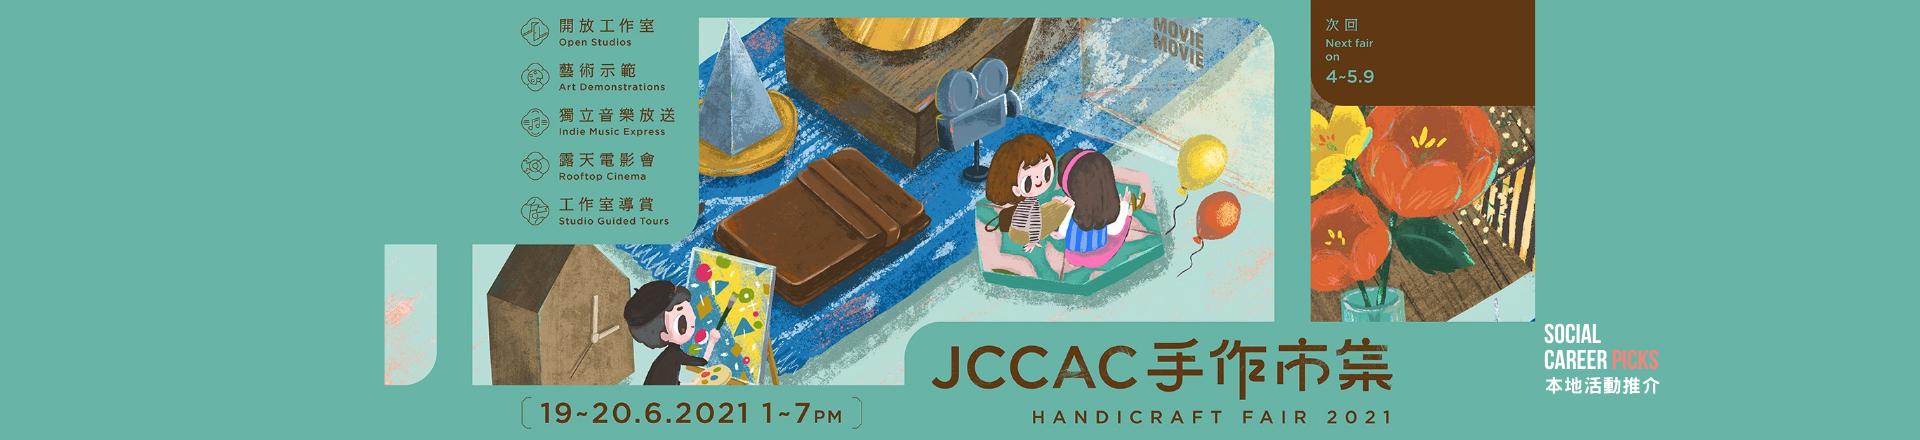 JCCAC 手作市集 六月 2021年.png